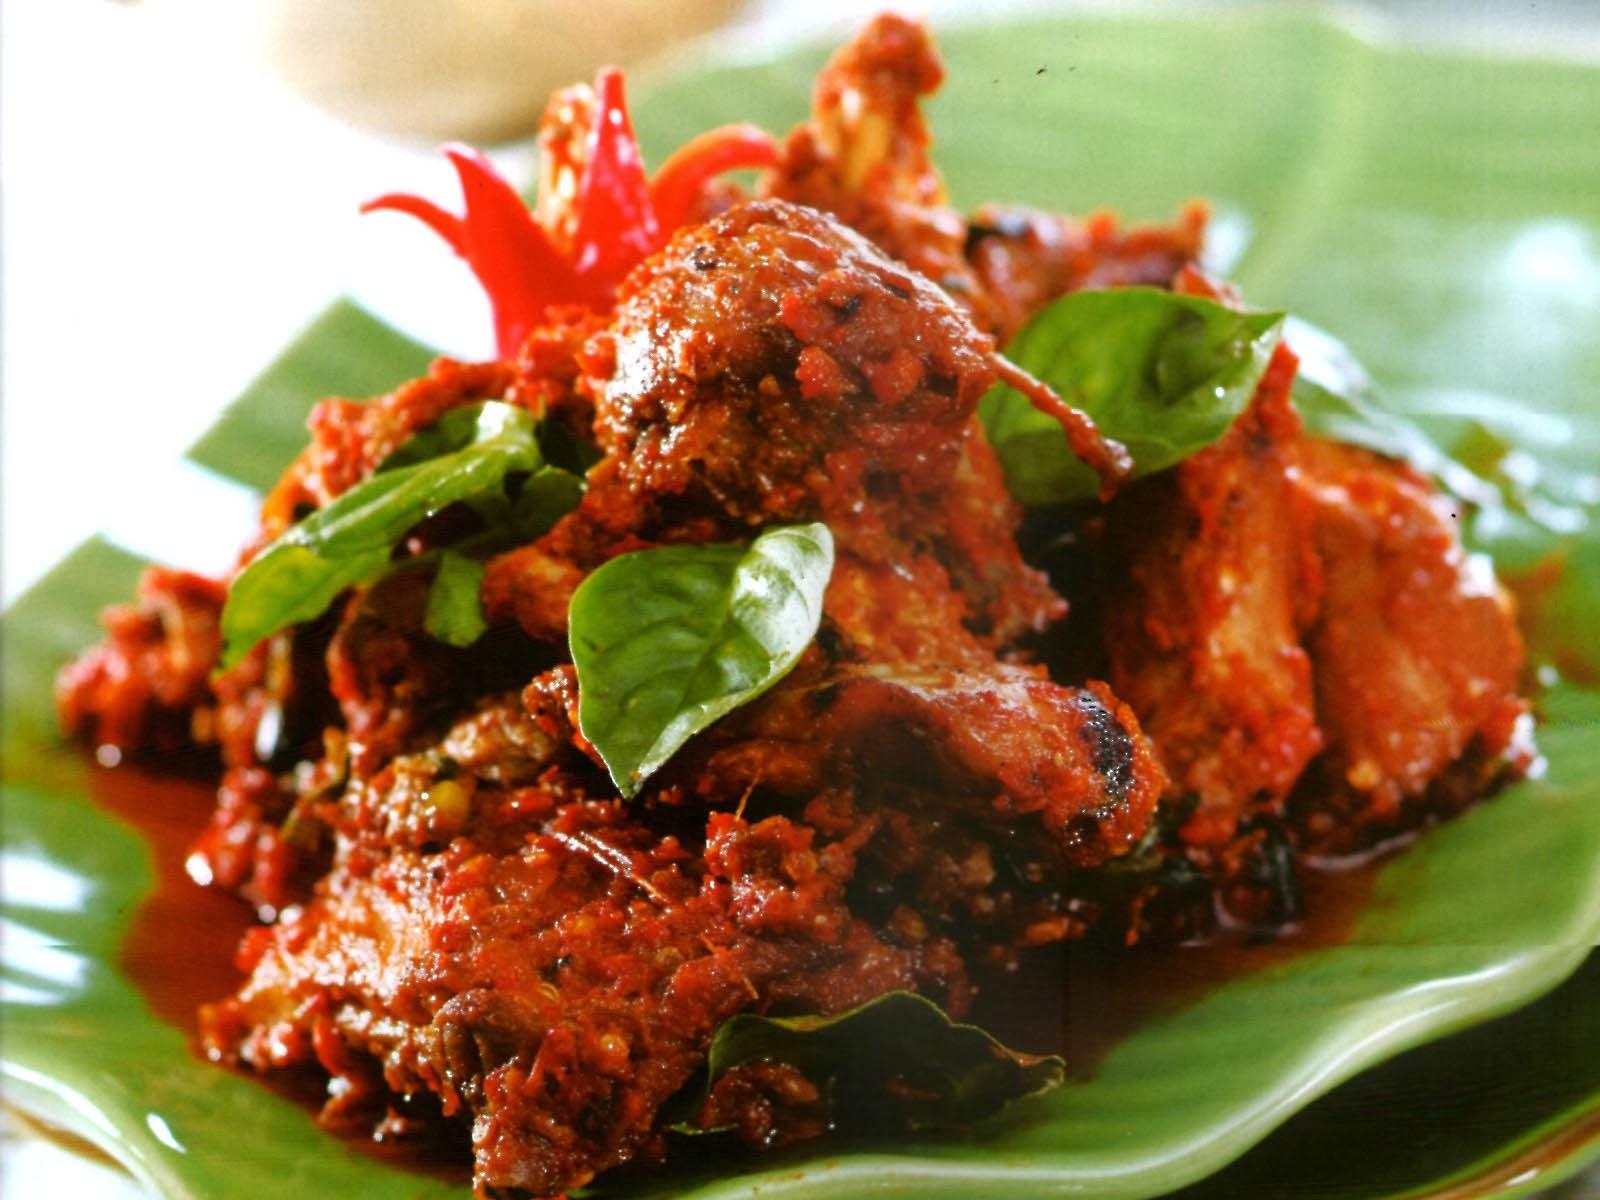 Resep Masakan Ayam Pedas Rica Rica